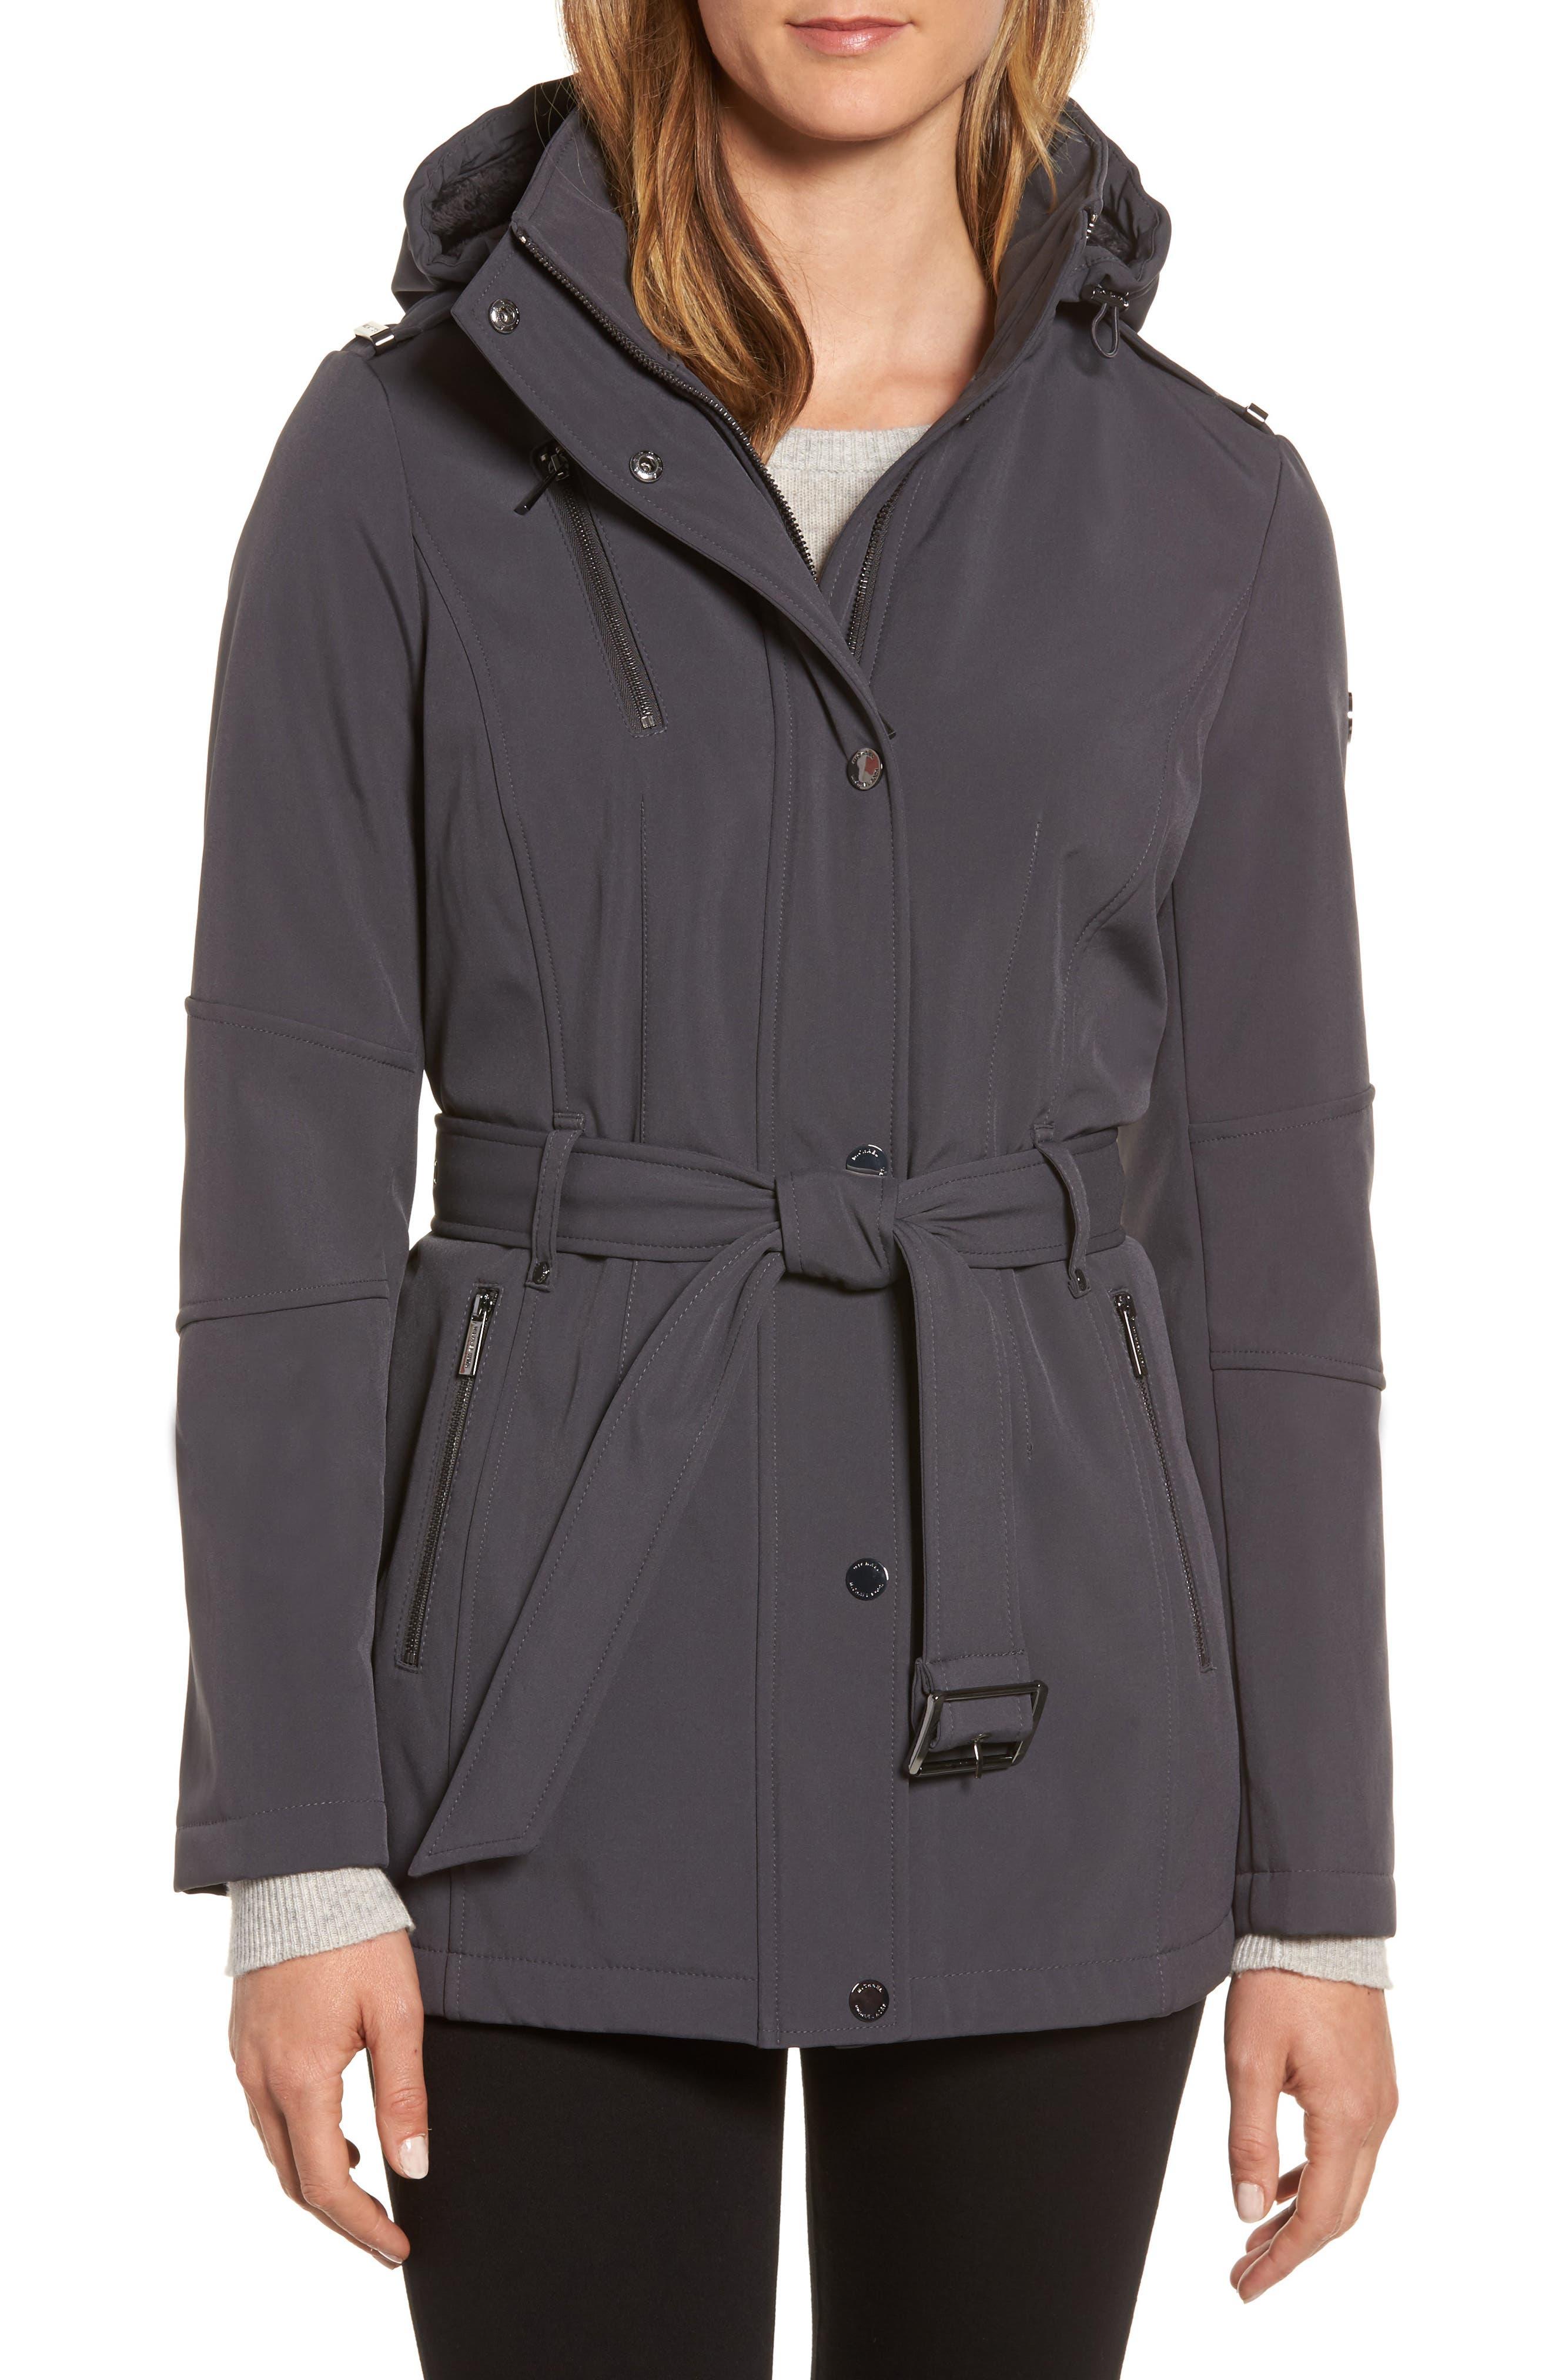 Main Image - MICHAEL Michael Kors Waterproof Belted Jacket with Detachable Hood